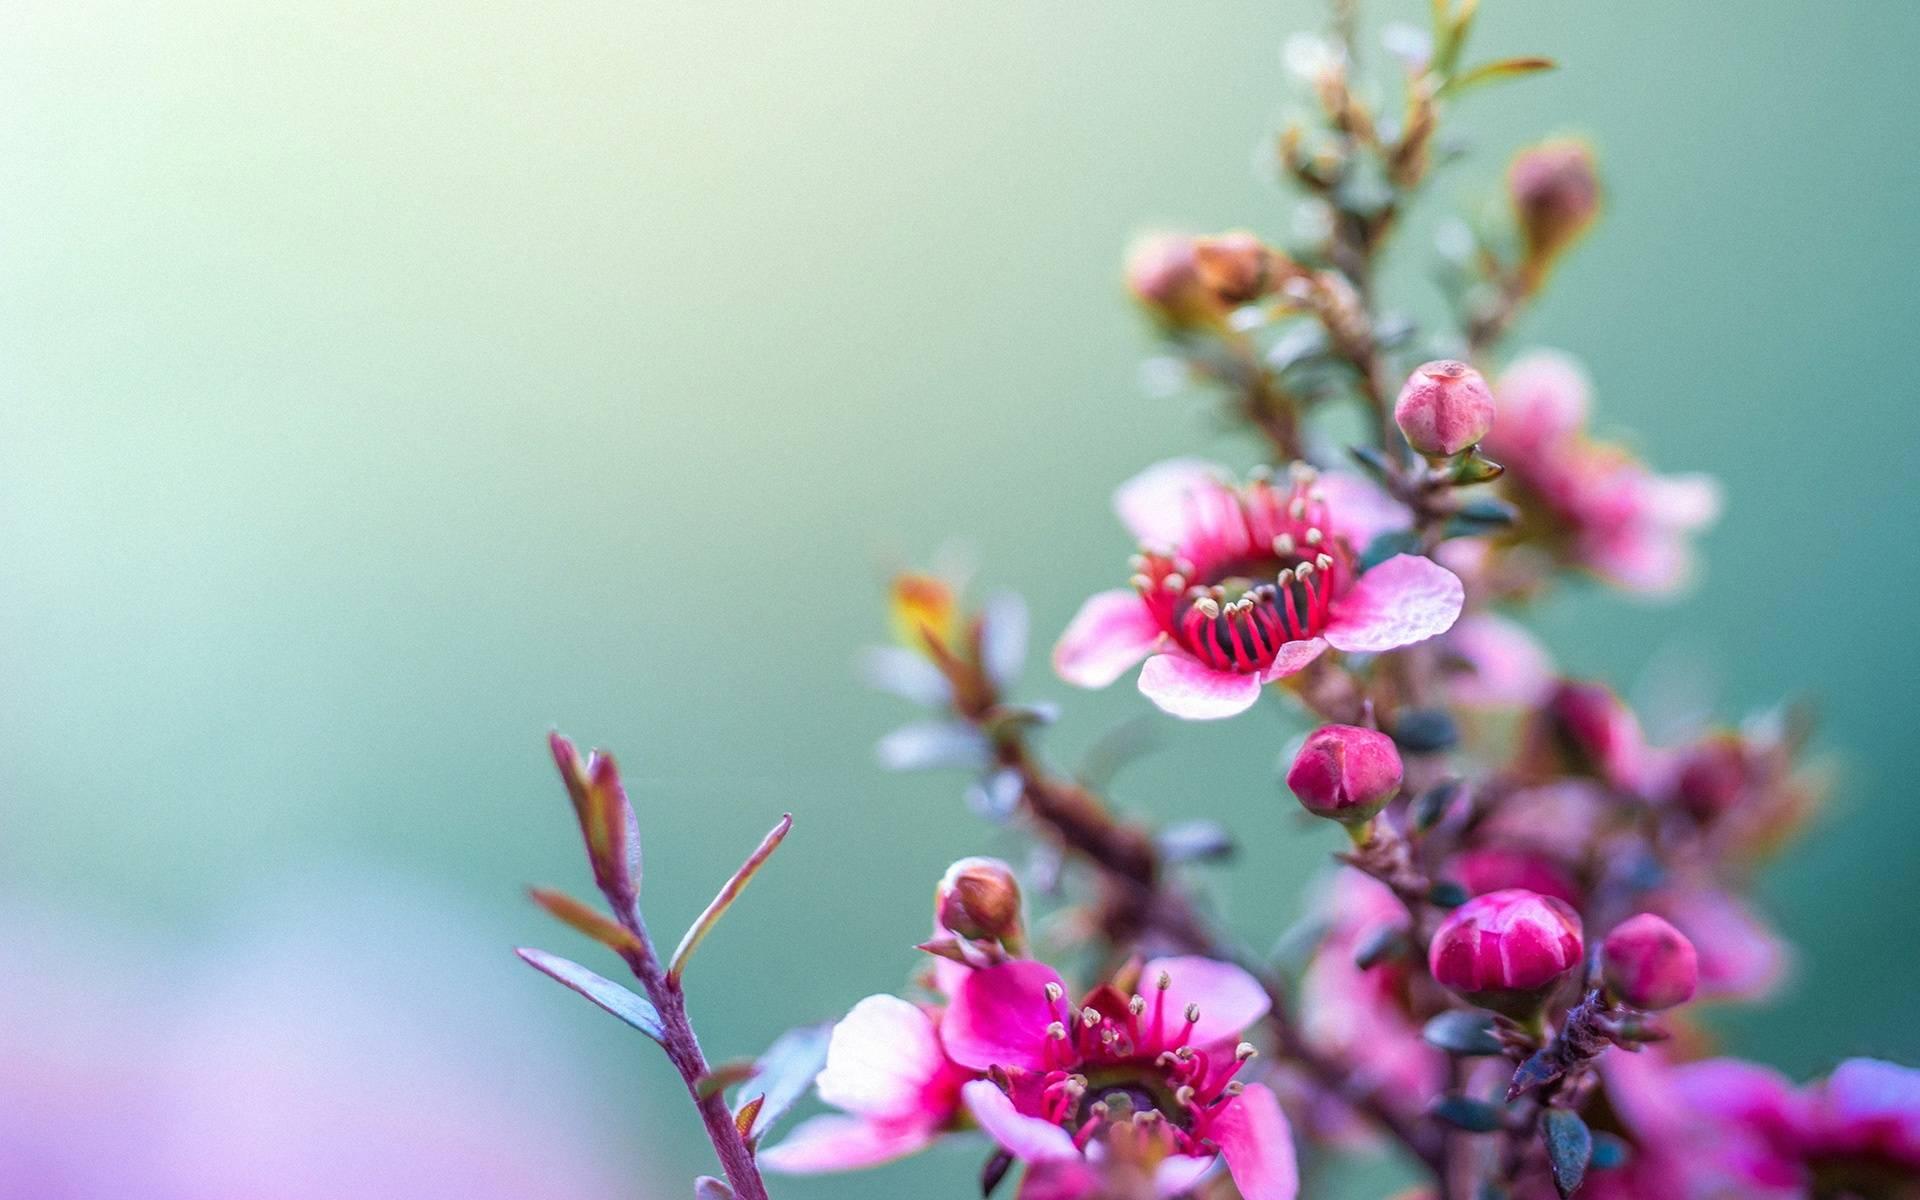 Spring Flower Wallpaper 1920x1200